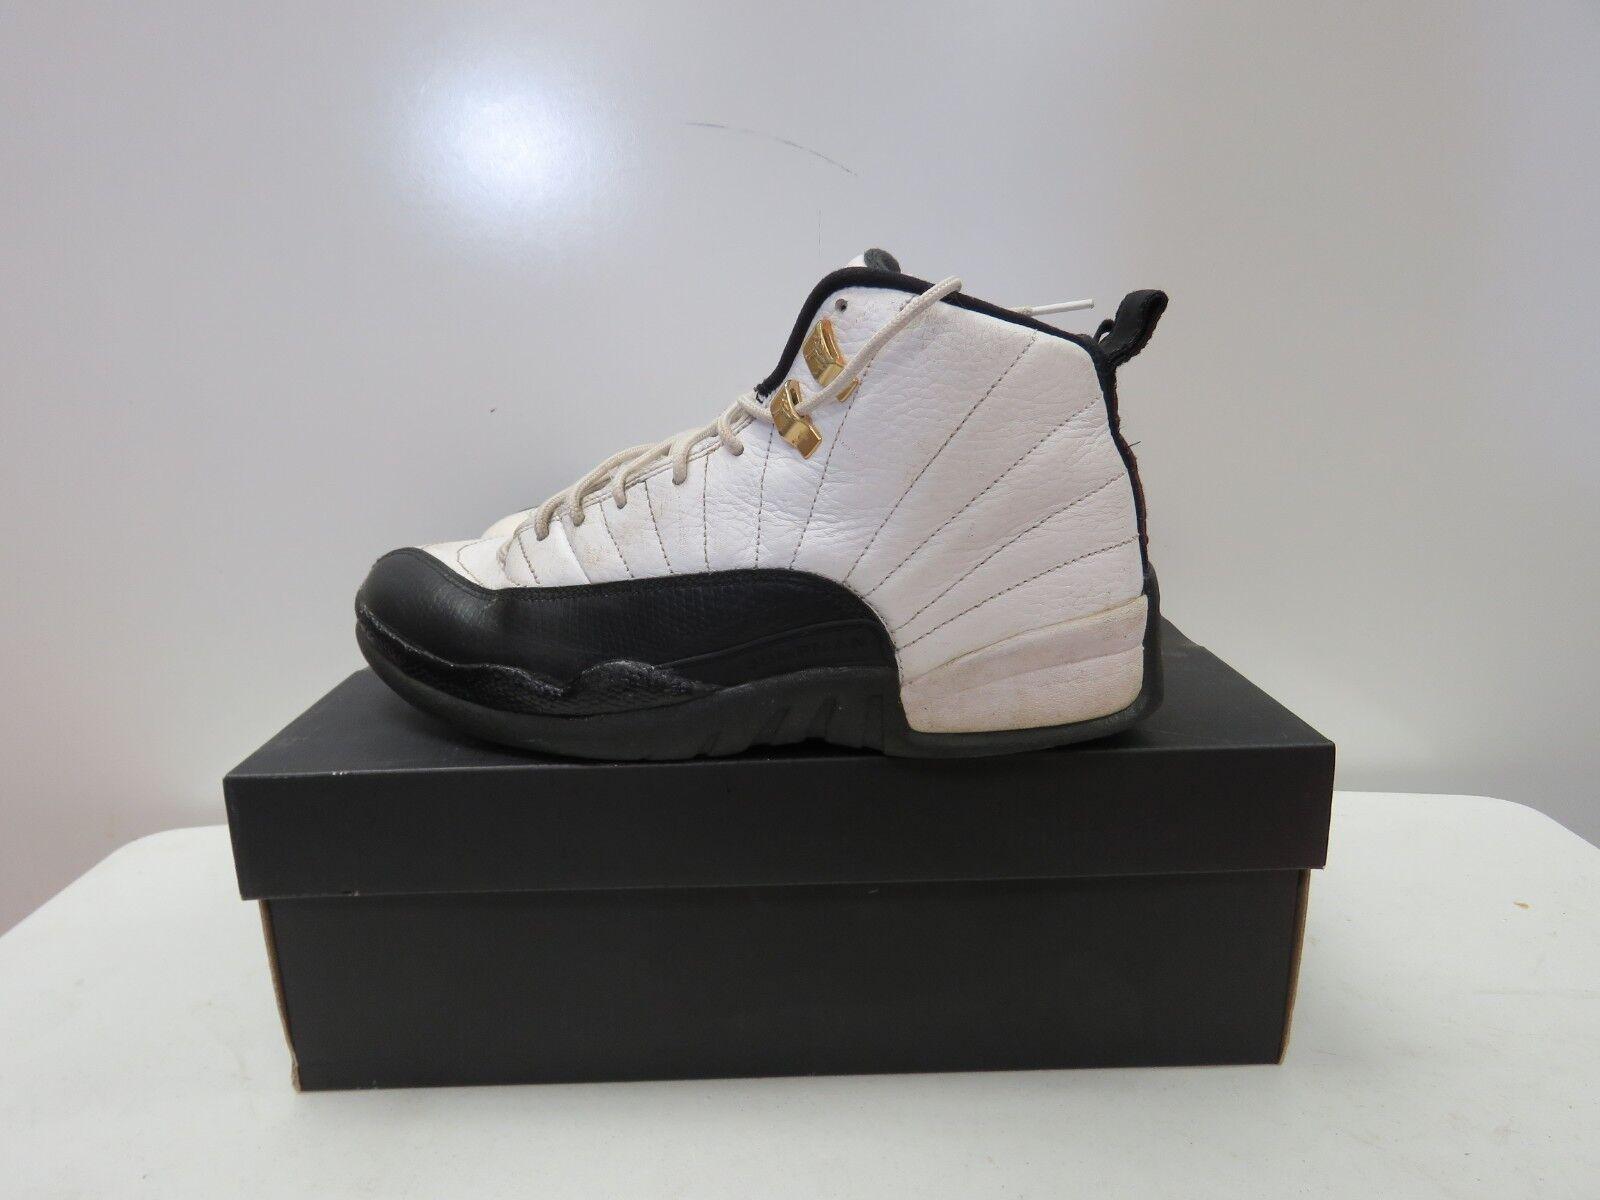 Nike Air Jordan XII 12 Retro BLACK WHITE TAXI RED 130690-125 Size 8 i147K